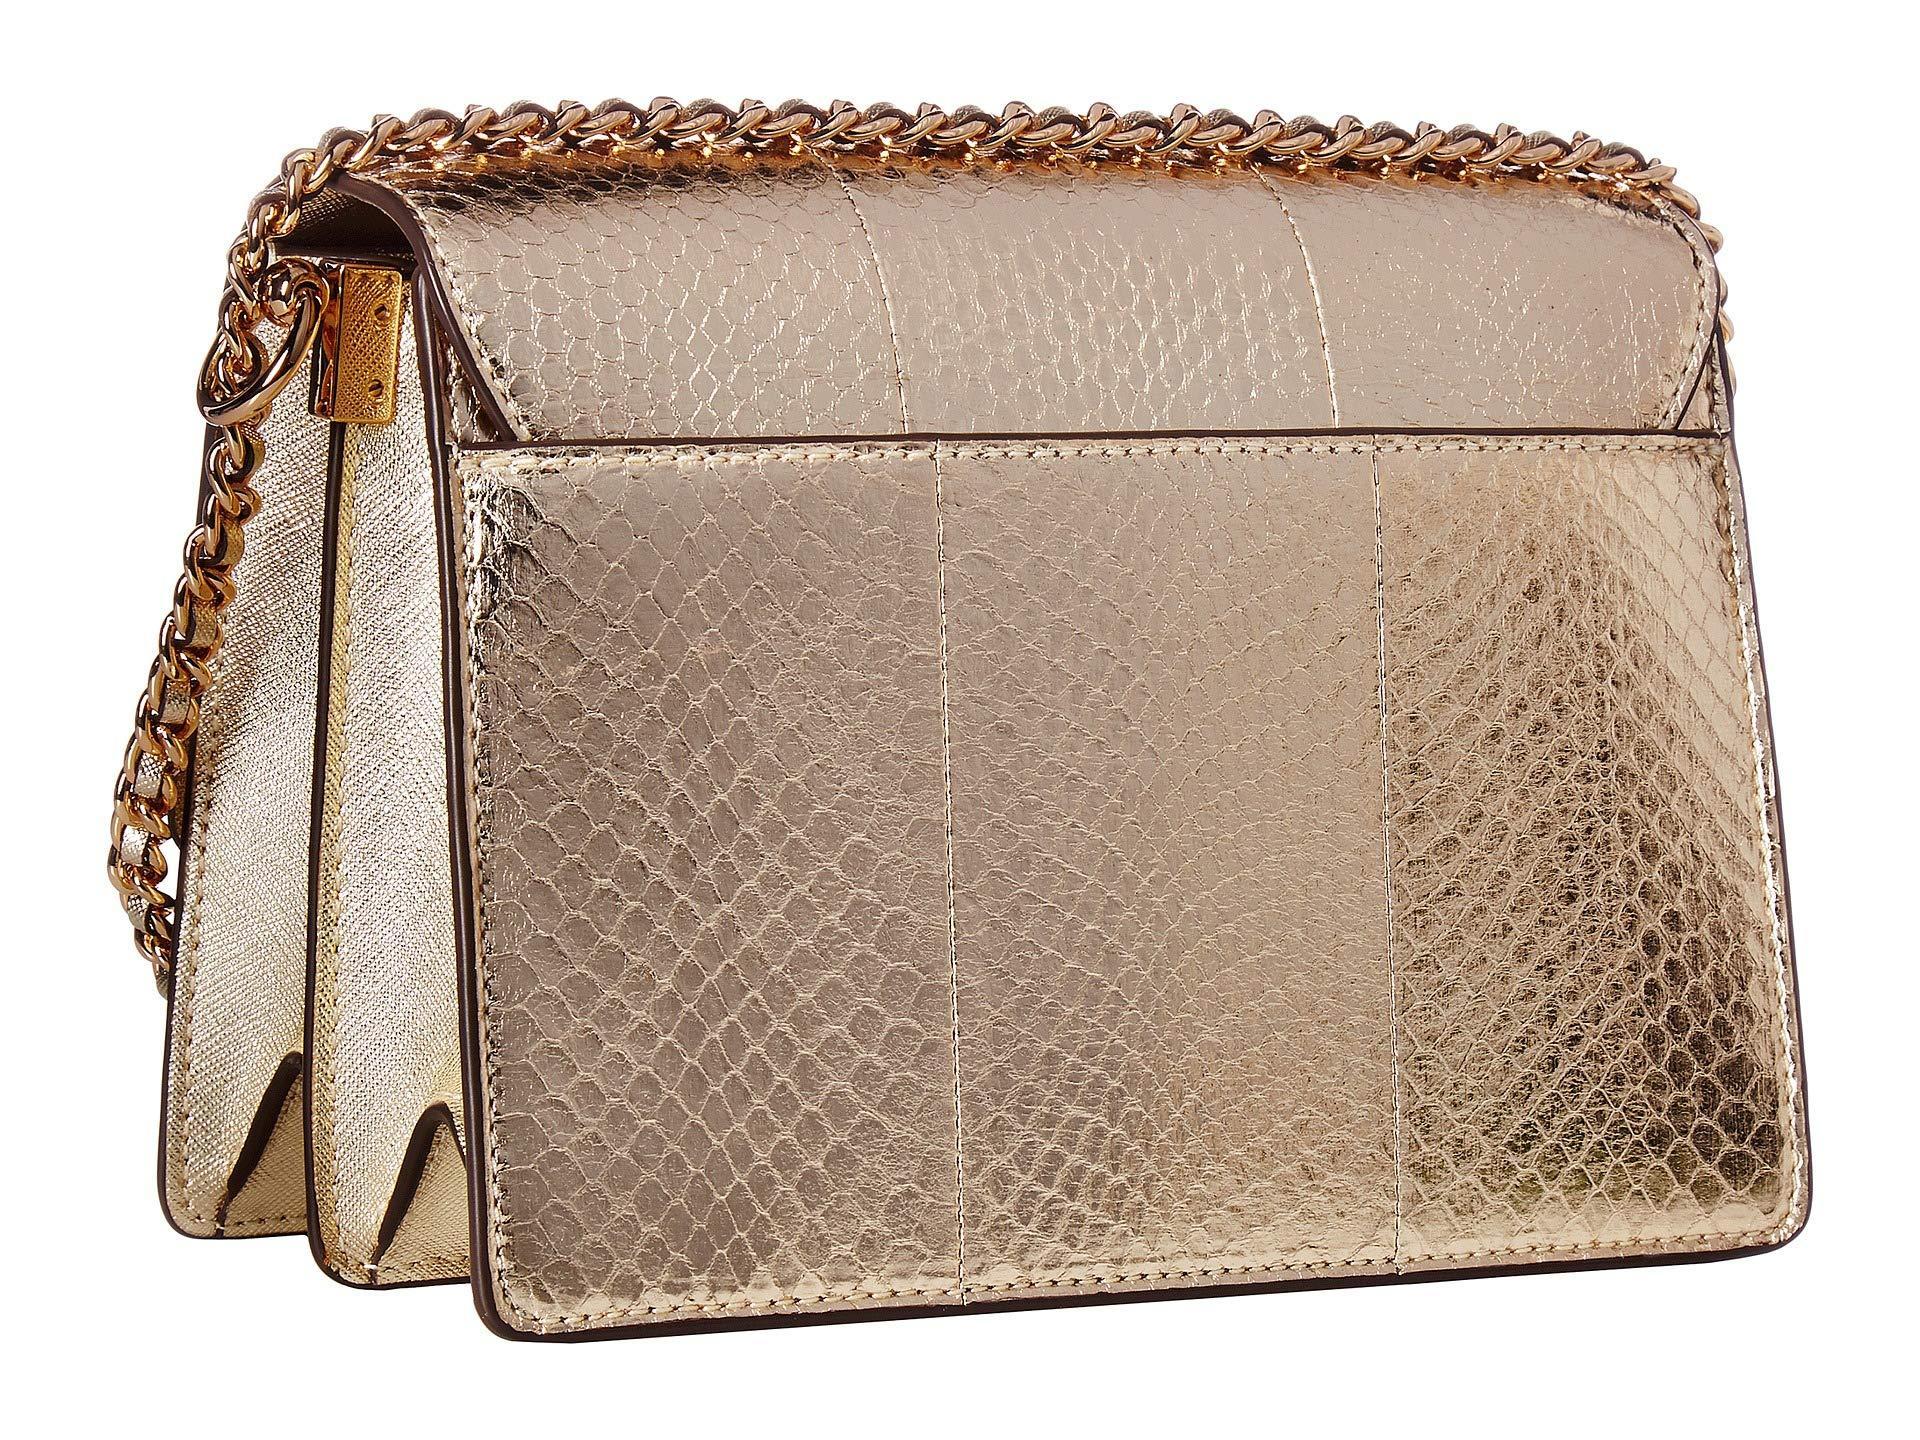 a71d270a77d48 Tory Burch - Metallic Robinson Exotic Convertible Shoulder Bag - Lyst. View  fullscreen